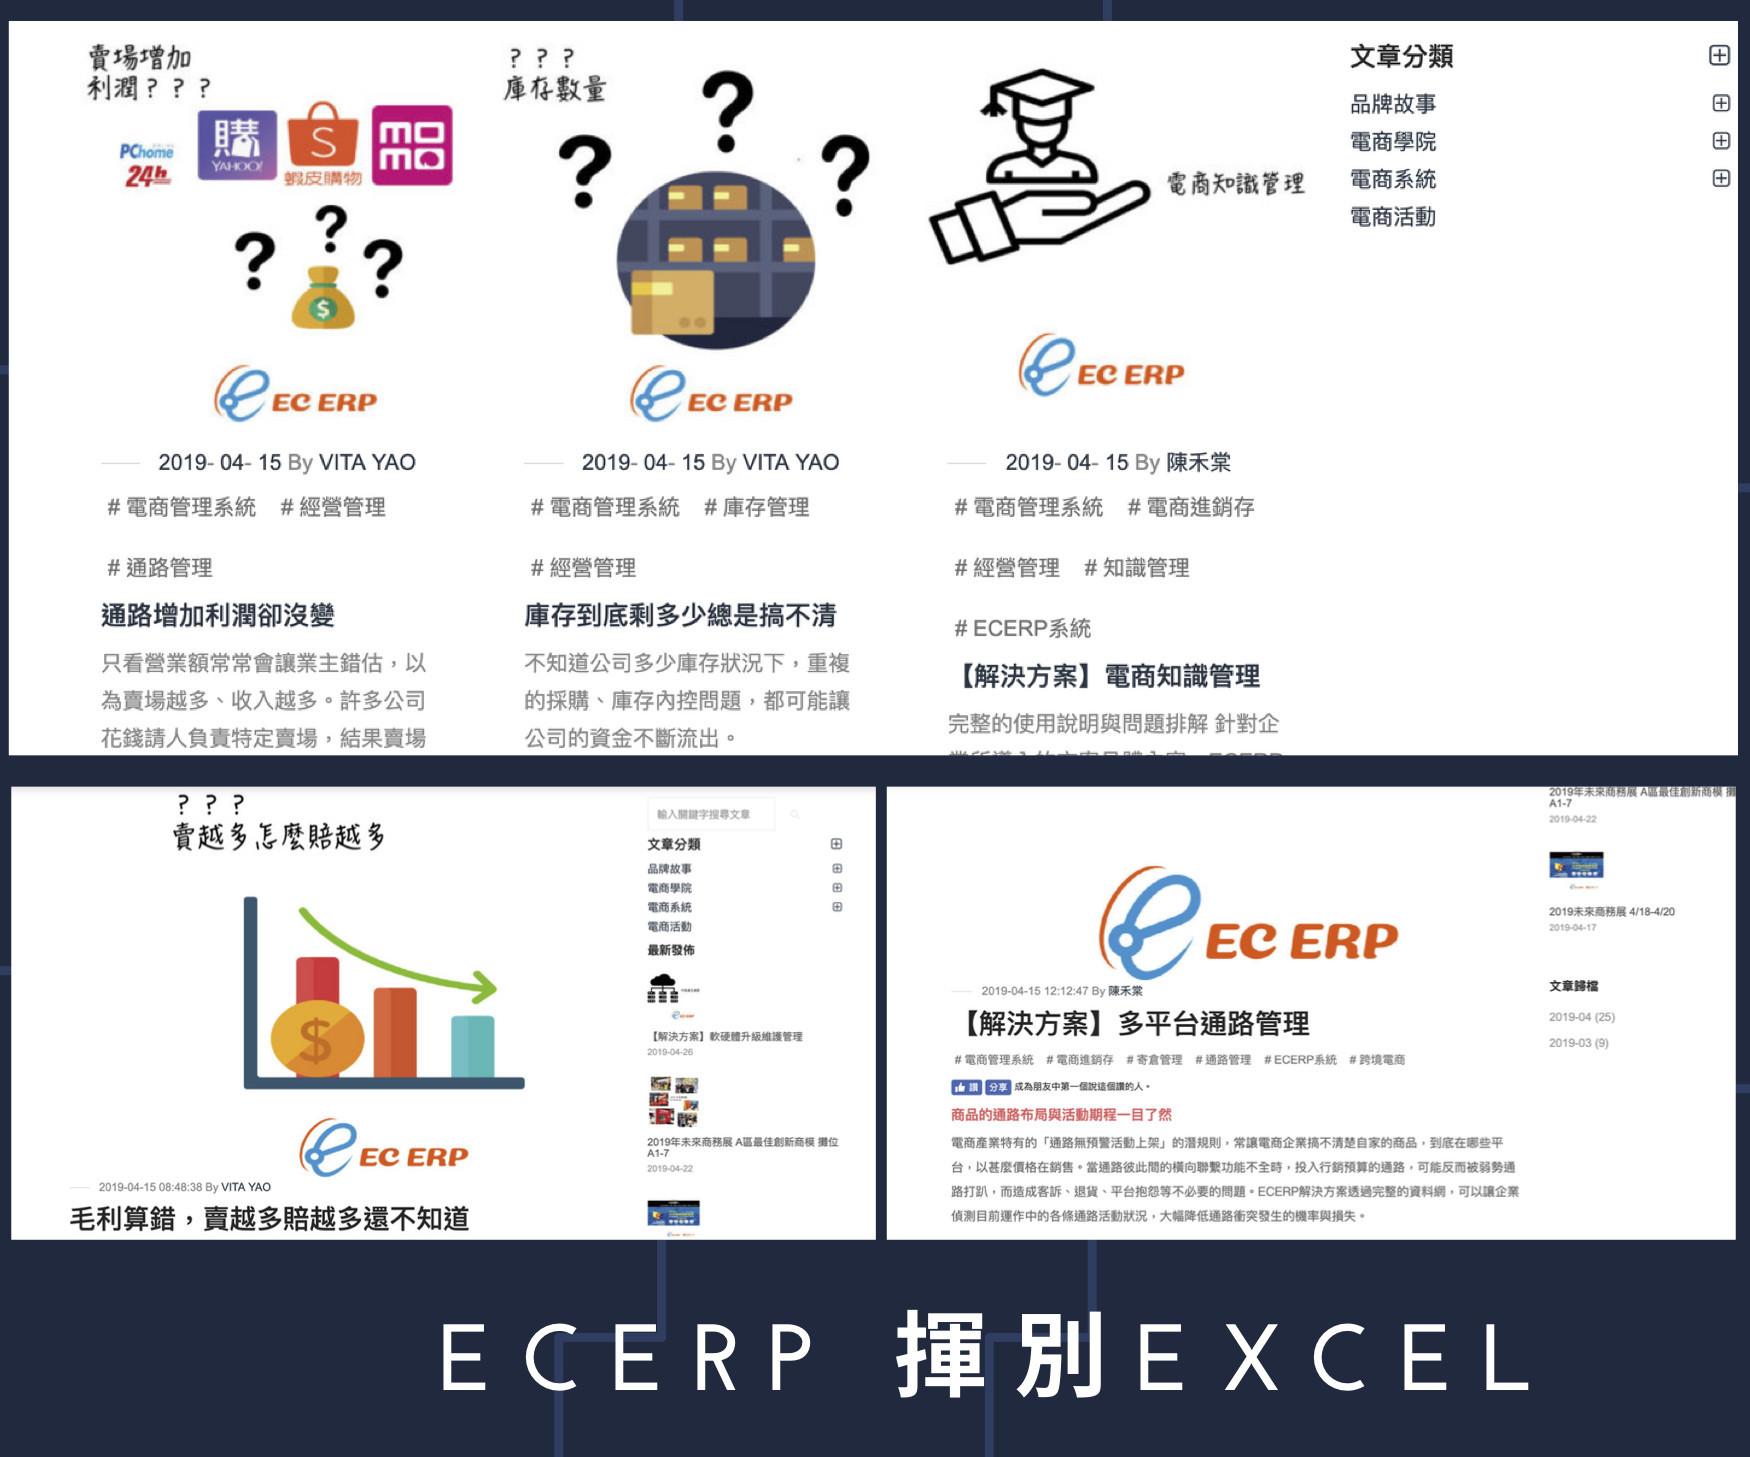 ECERP 揮別Excel,悠立得電商管理系統 電商學院